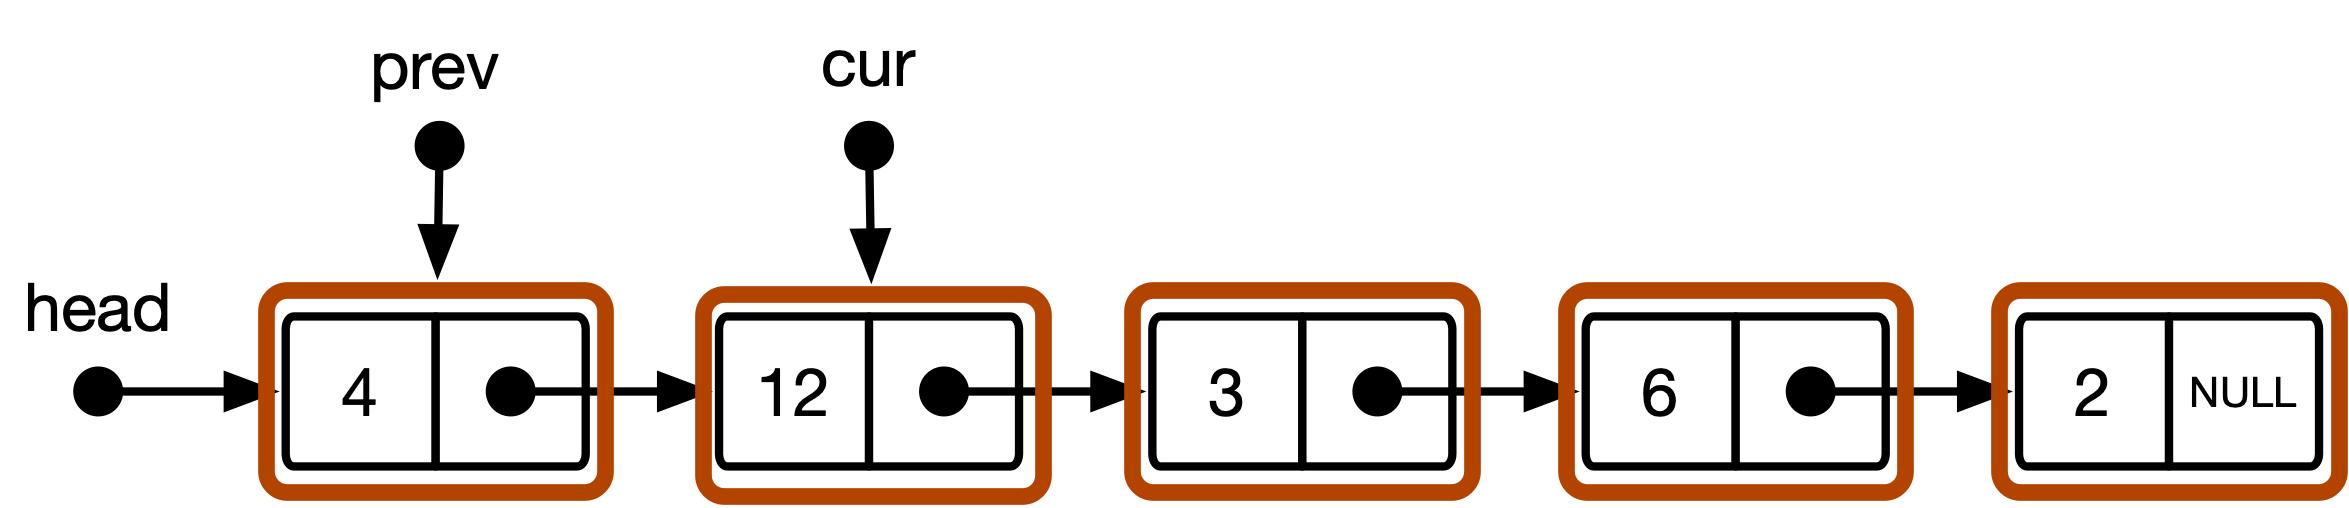 simple data model